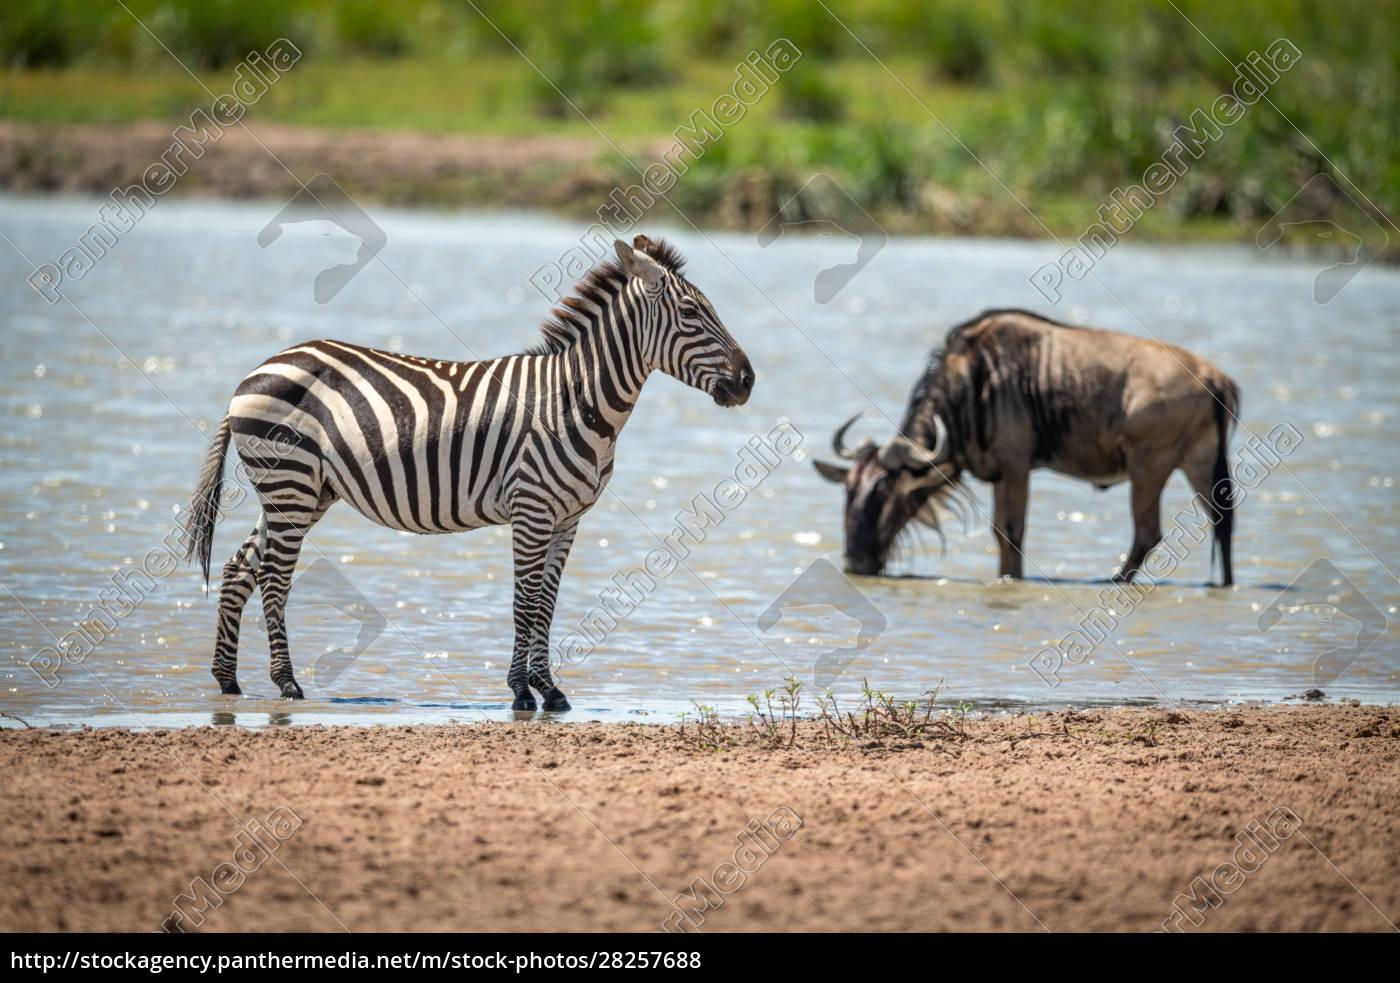 plains, zebra, stands, in, shallows, near - 28257688